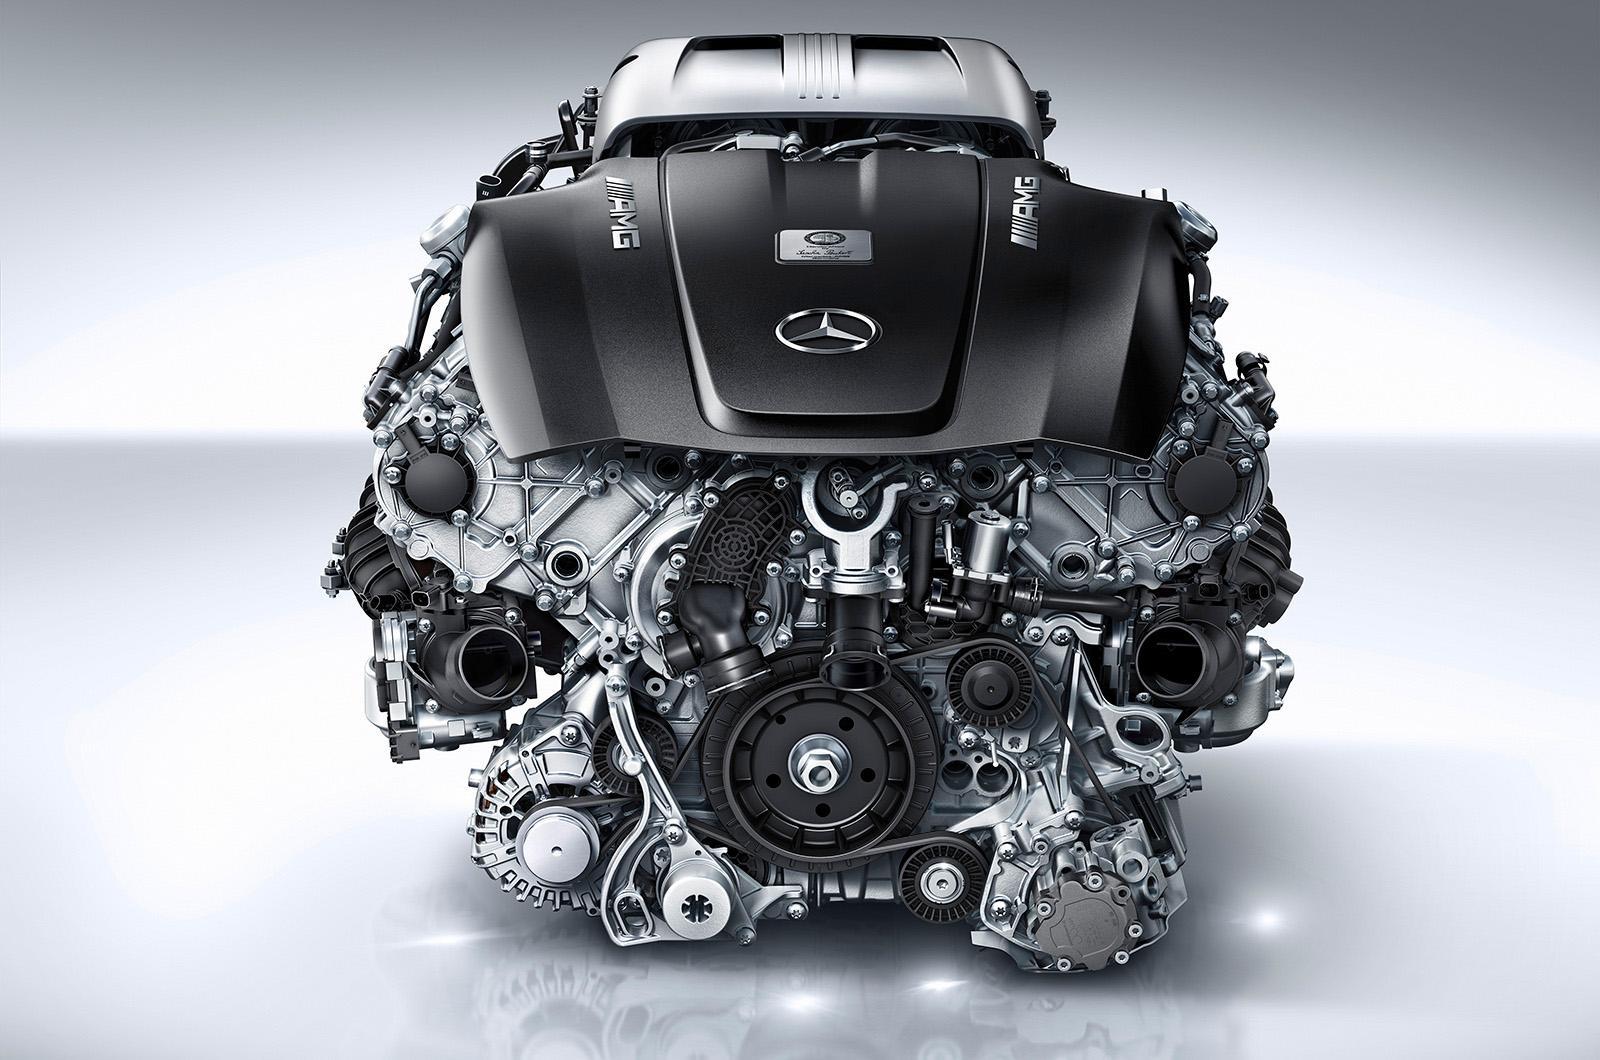 Mercedes Amg Gt Engine Mclaren P1 Gtr 2017 Mustang Configurator Today S Car News